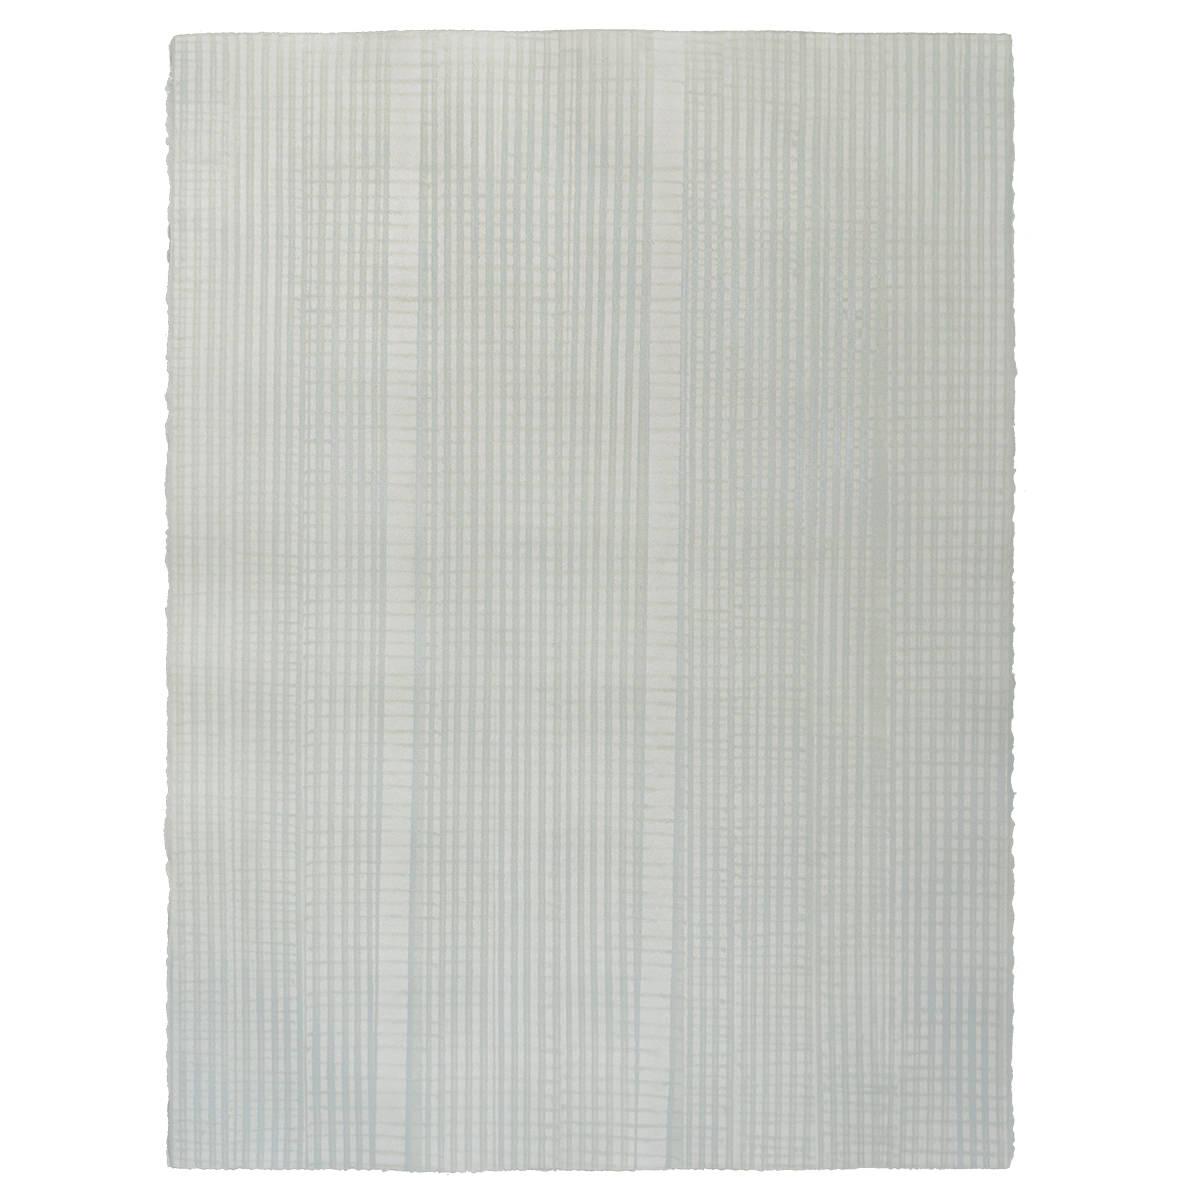 Traveller - Sage - Hand-painted sheet wallpaper